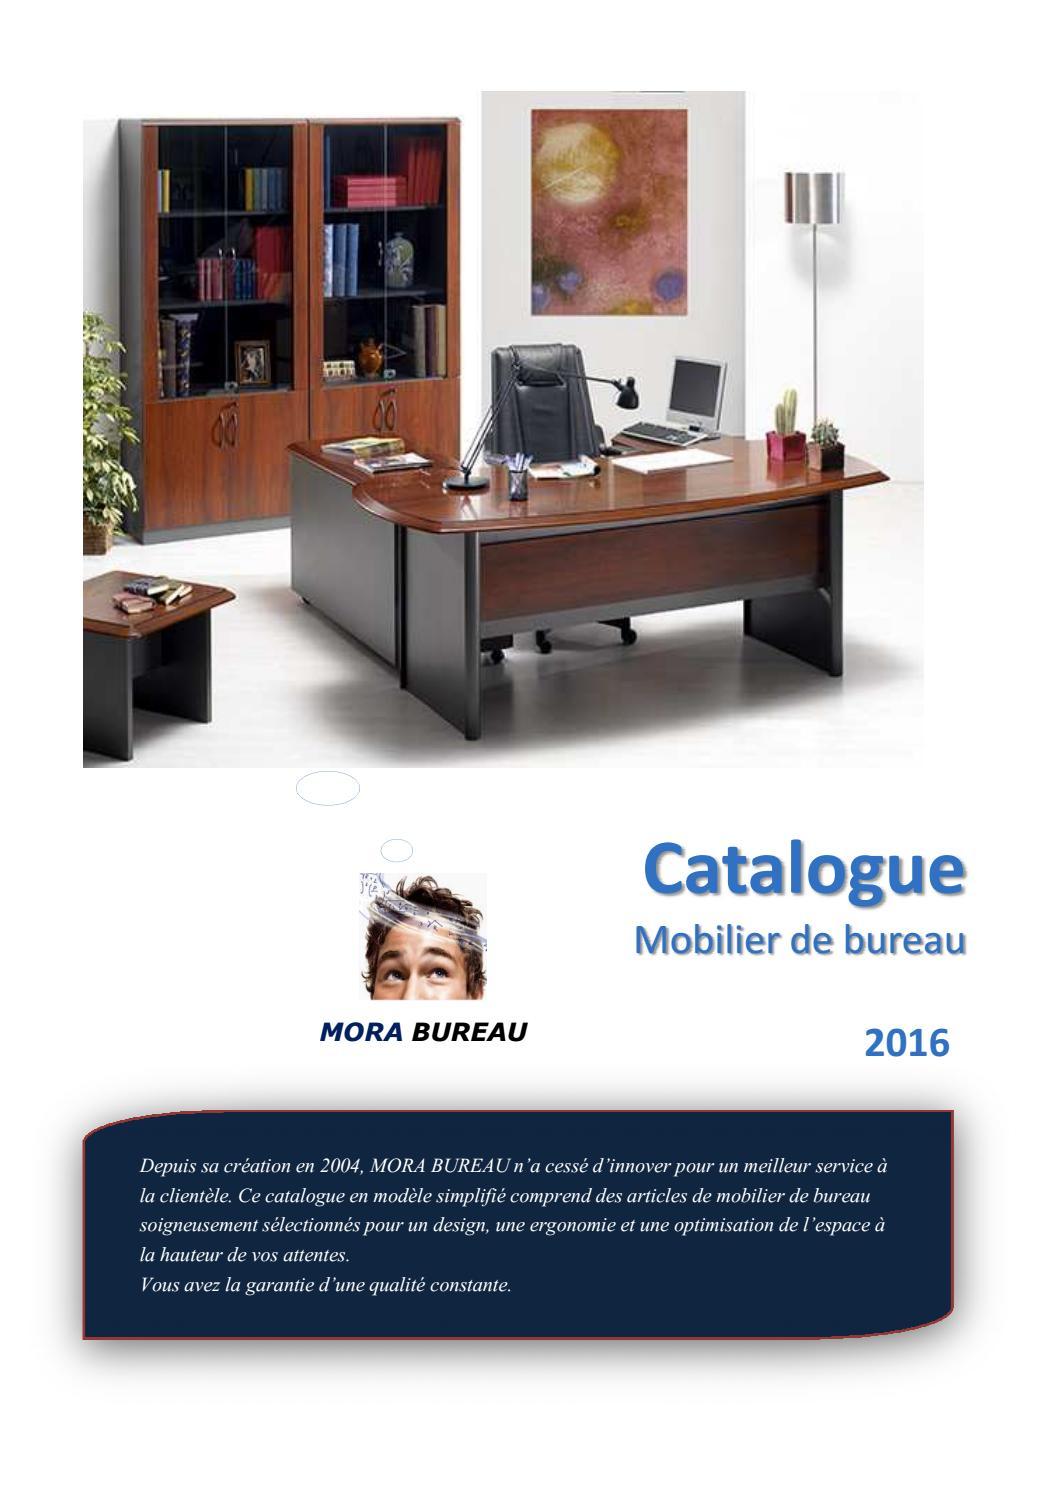 Catalogue mobilier mora bureau 2016 by mora bureau issuu - Mobilier de bureau montpellier ...